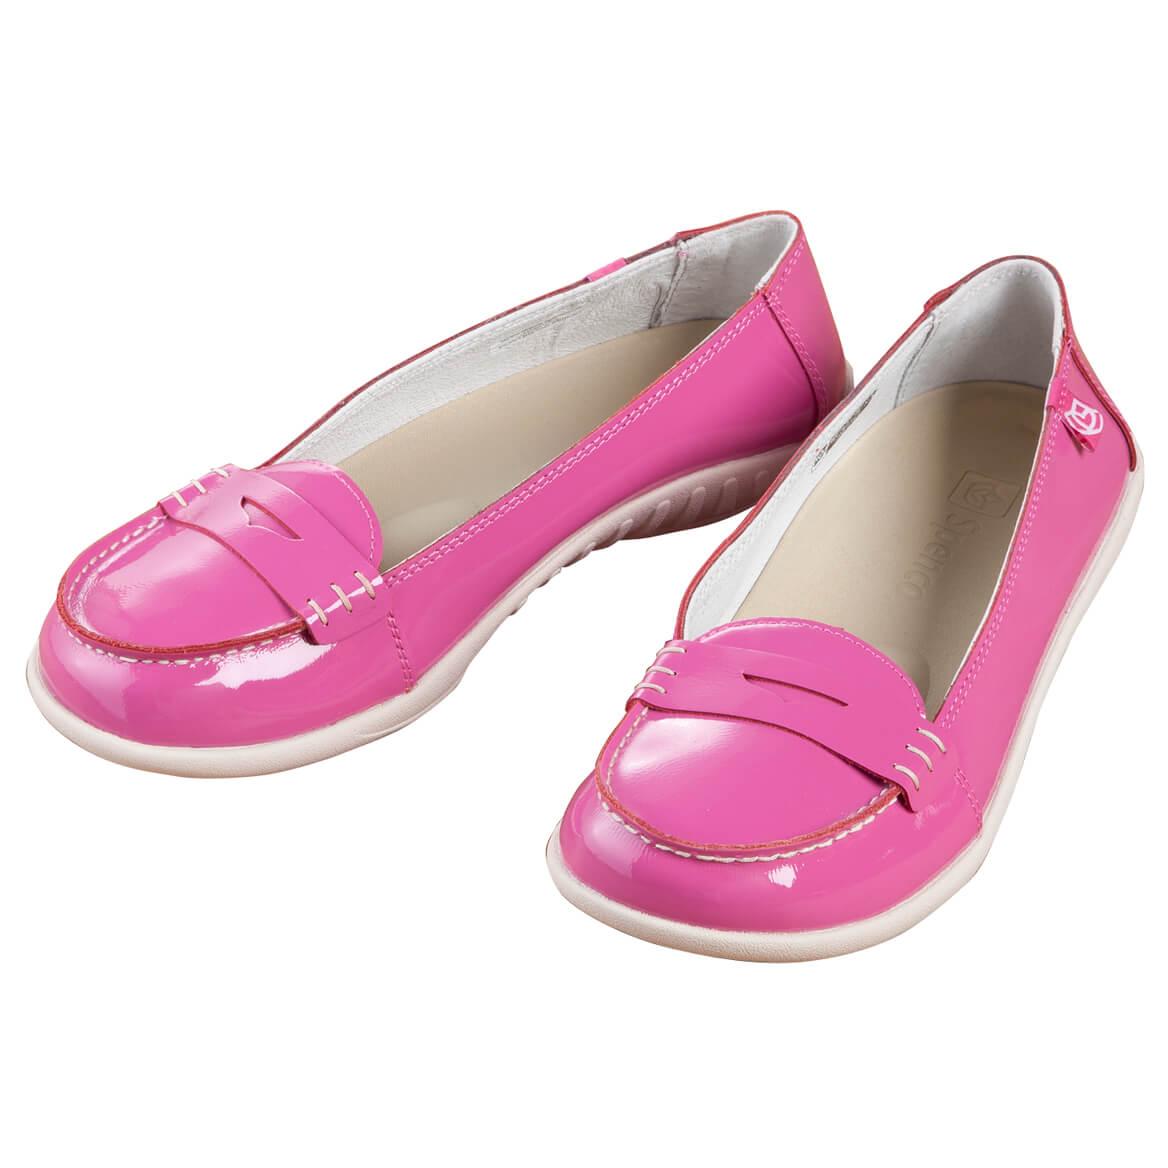 Spenco® Siesta Penny Patent Leather